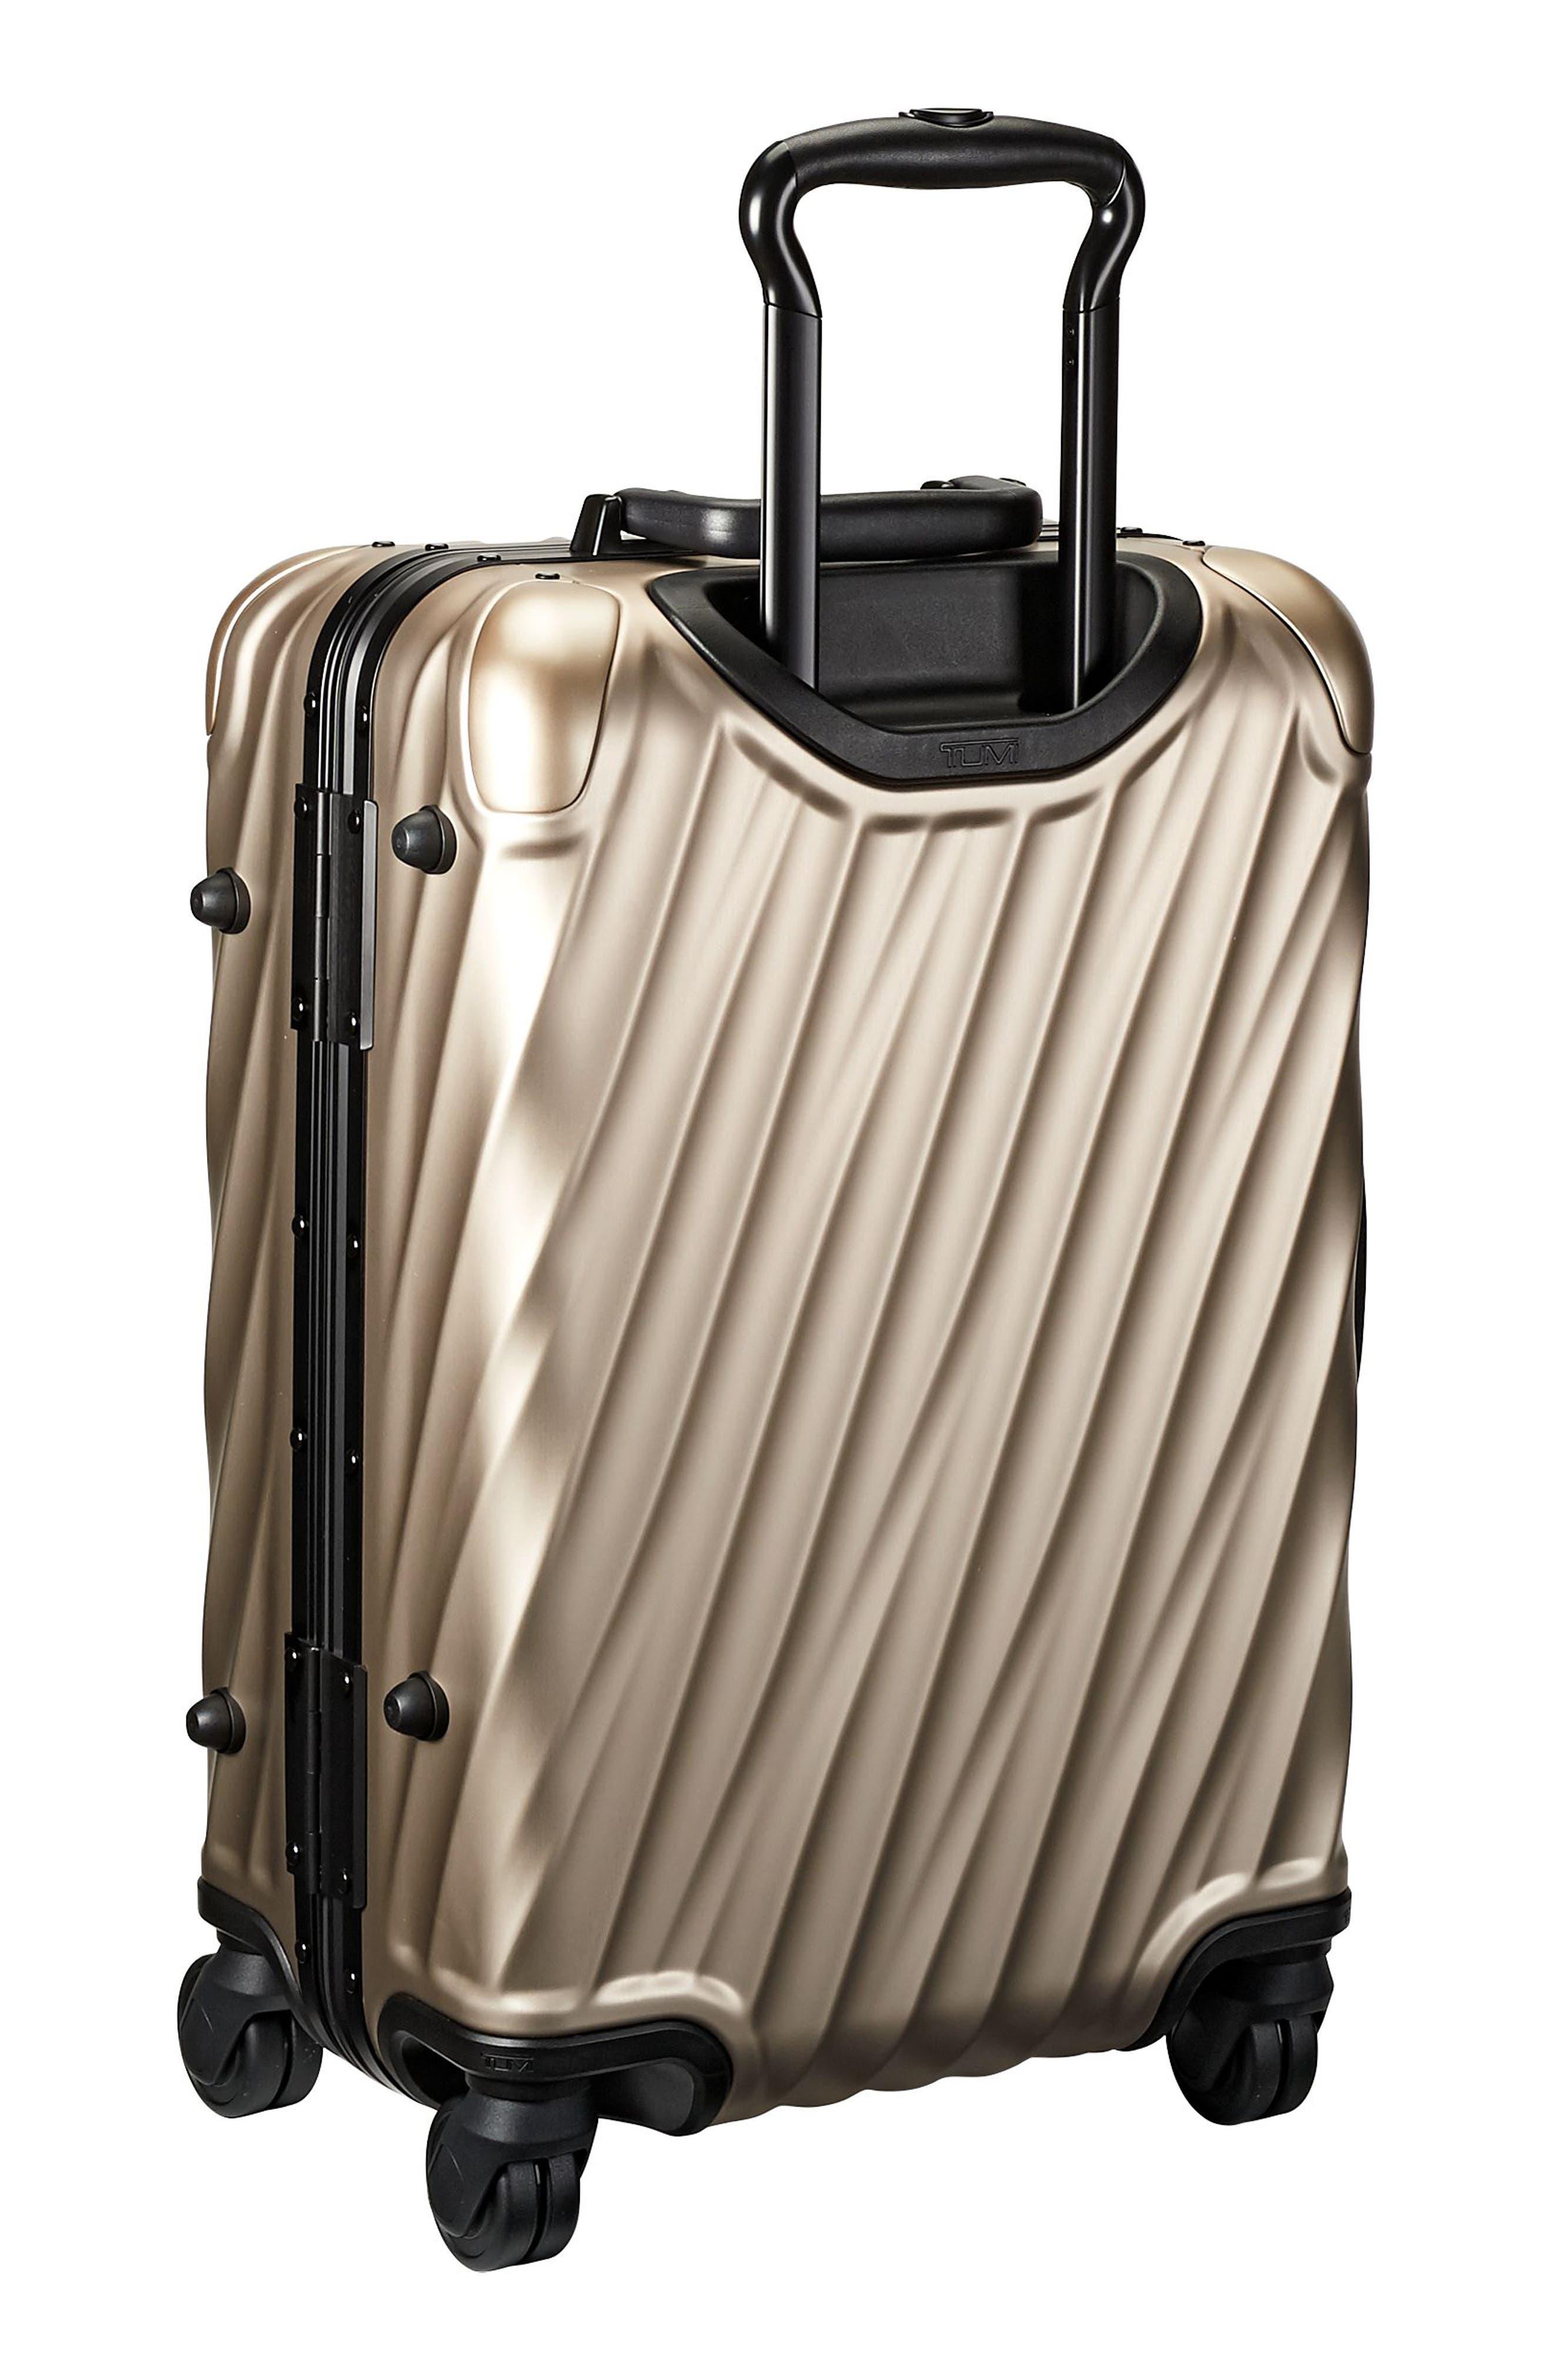 19-Degree 22-Inch Aluminum Spinner Carry-On,                             Alternate thumbnail 3, color,                             Ivory Gold